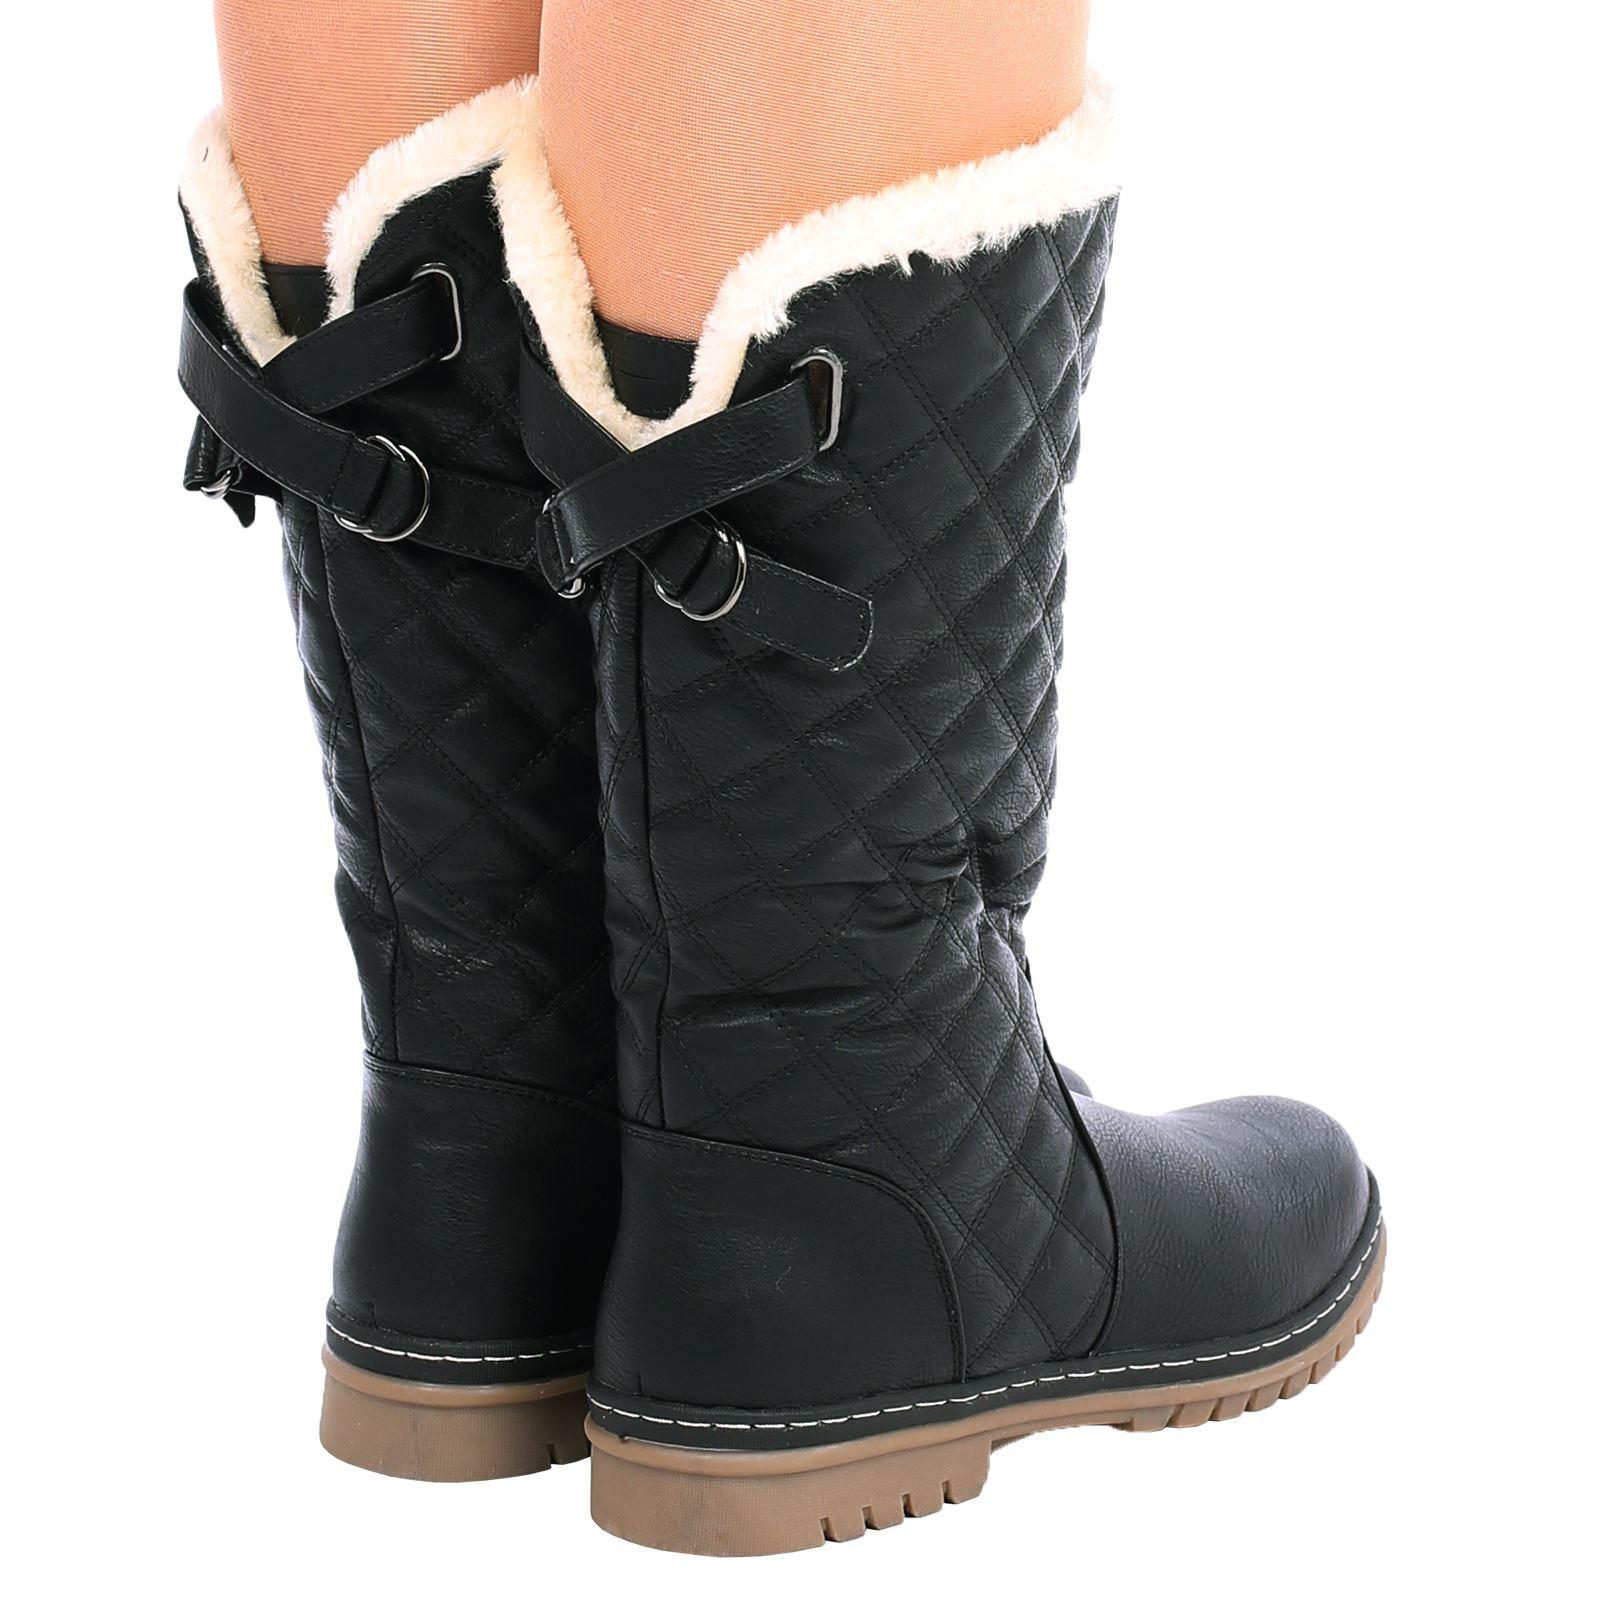 Womens Size 4 Winter Boots | Homewood Mountain Ski Resort